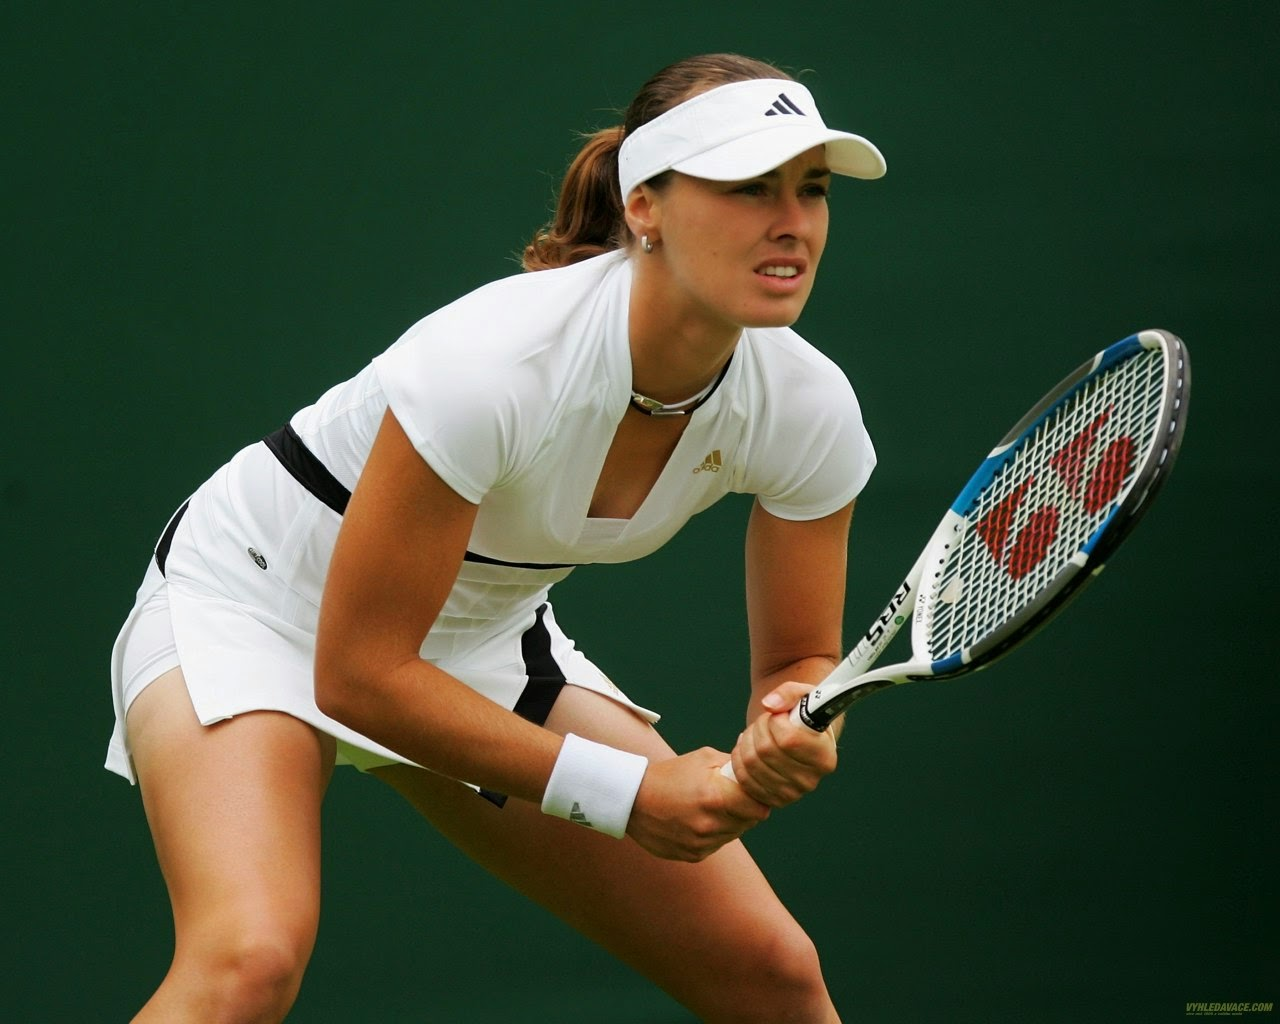 Players Gallery: Martina Hingis Tennis Player Bio News